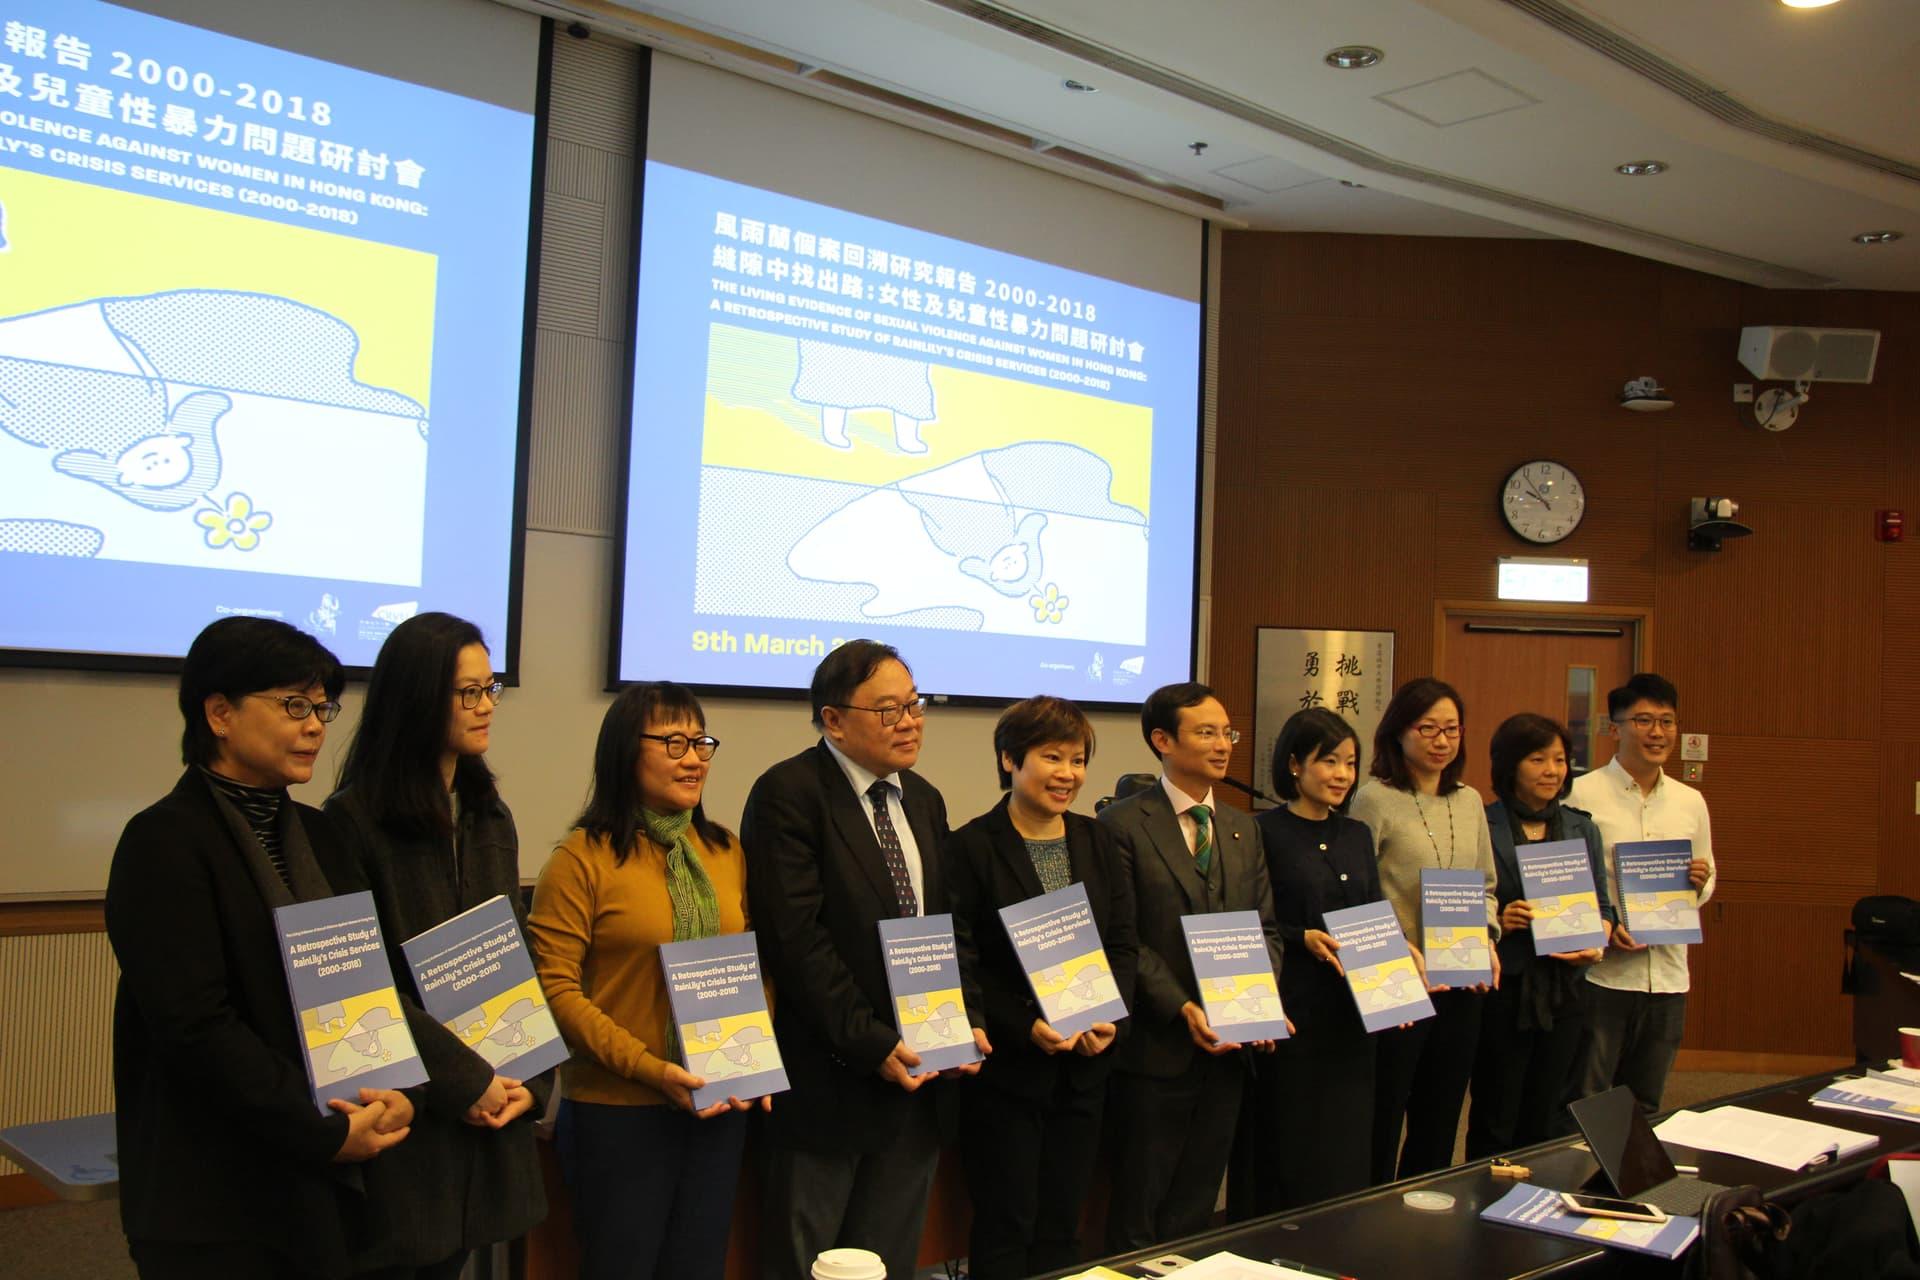 (From left) Dr. Lai Ching Leung, Dr. Shirley Hung, Ms. Chelsea Ma, Ms. Doris Fok, Dr. Philip Beh, Ms. Linda Wong SY, Dr. Pierre Chan, Ms. Wai Man Chong, Ms. Linda Wong SH, Ms. Wing Yee Chan, Dr. Albert Yau